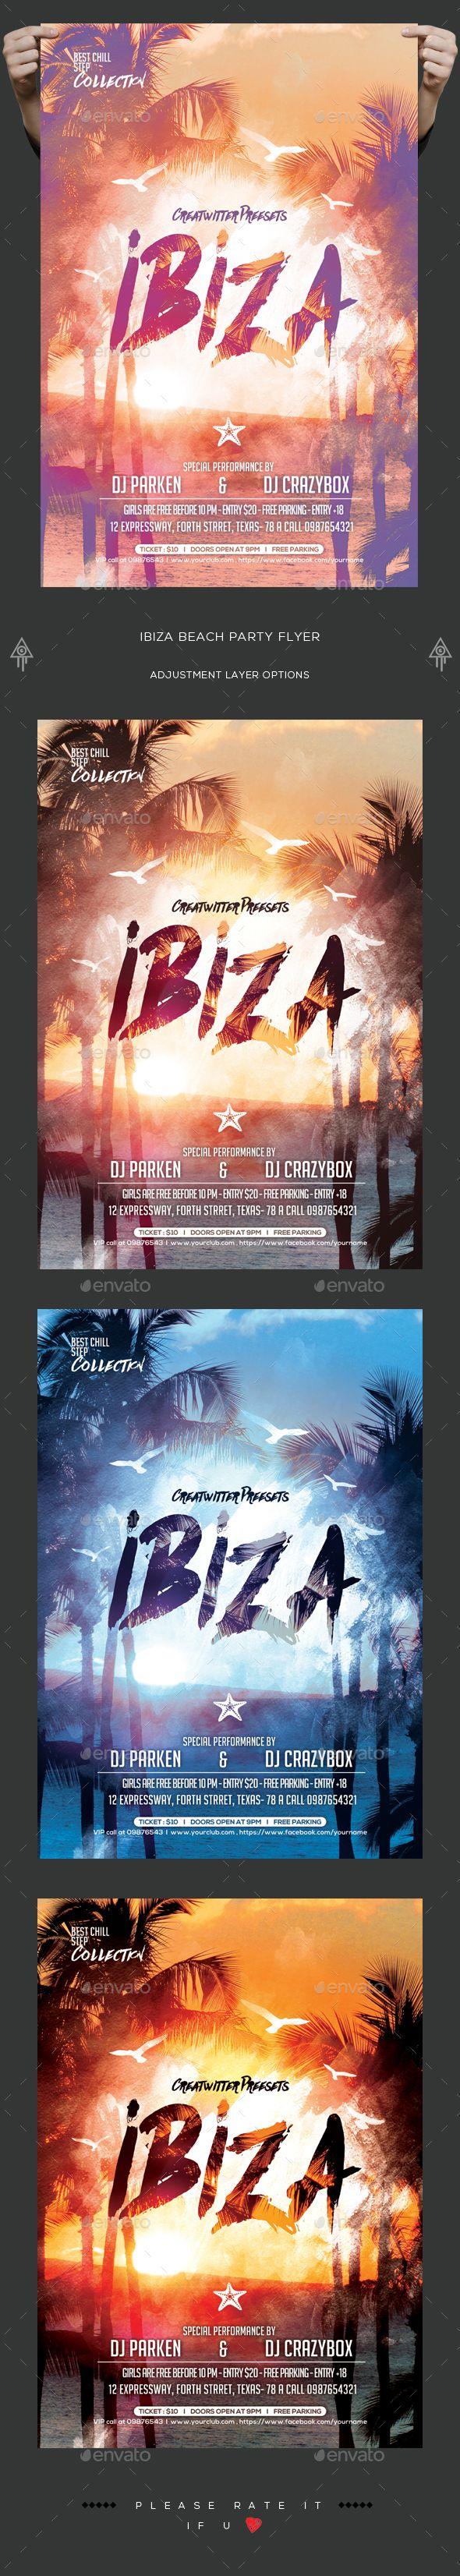 Ibiza Beach Party Flyer | Plakate